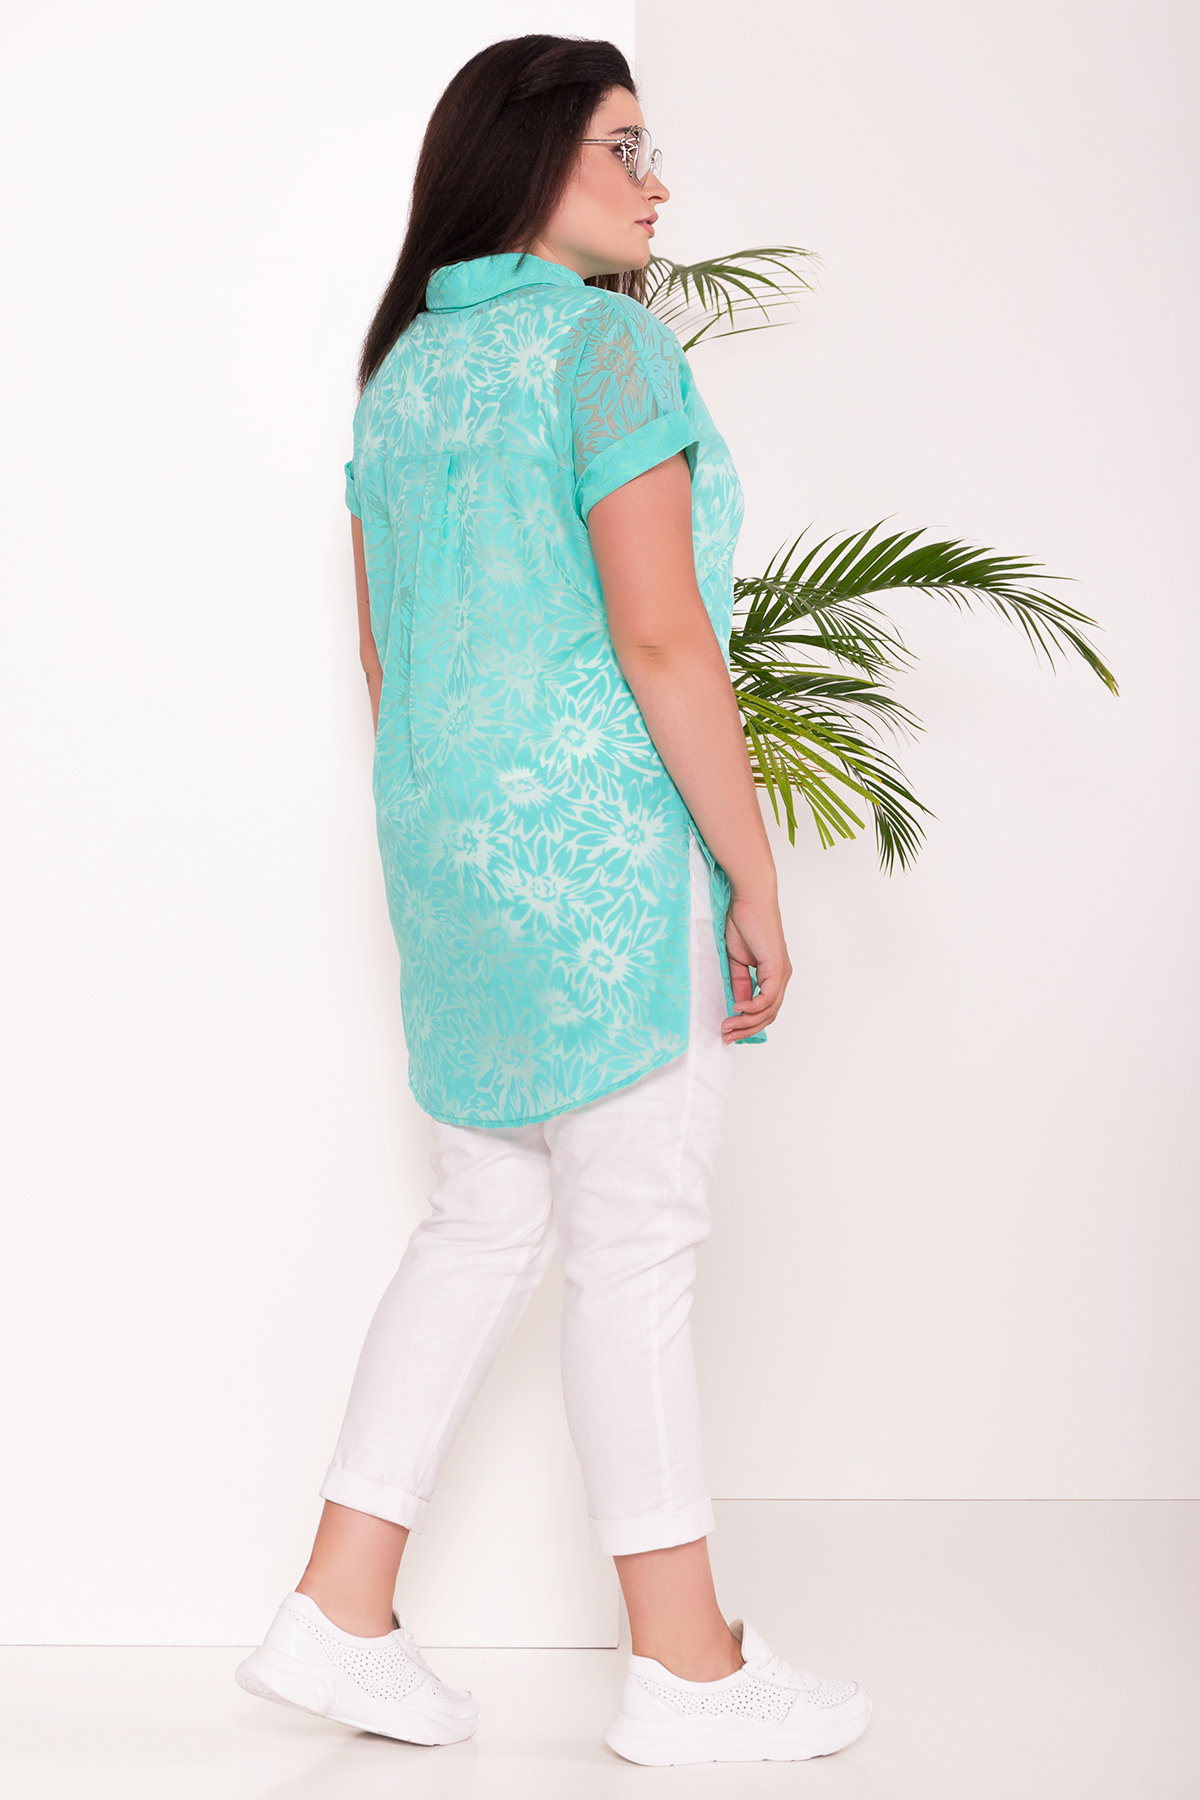 Комплект рубашка   майка  Аланья Donna 7579 АРТ. 43512 Цвет: Мята - фото 3, интернет магазин tm-modus.ru